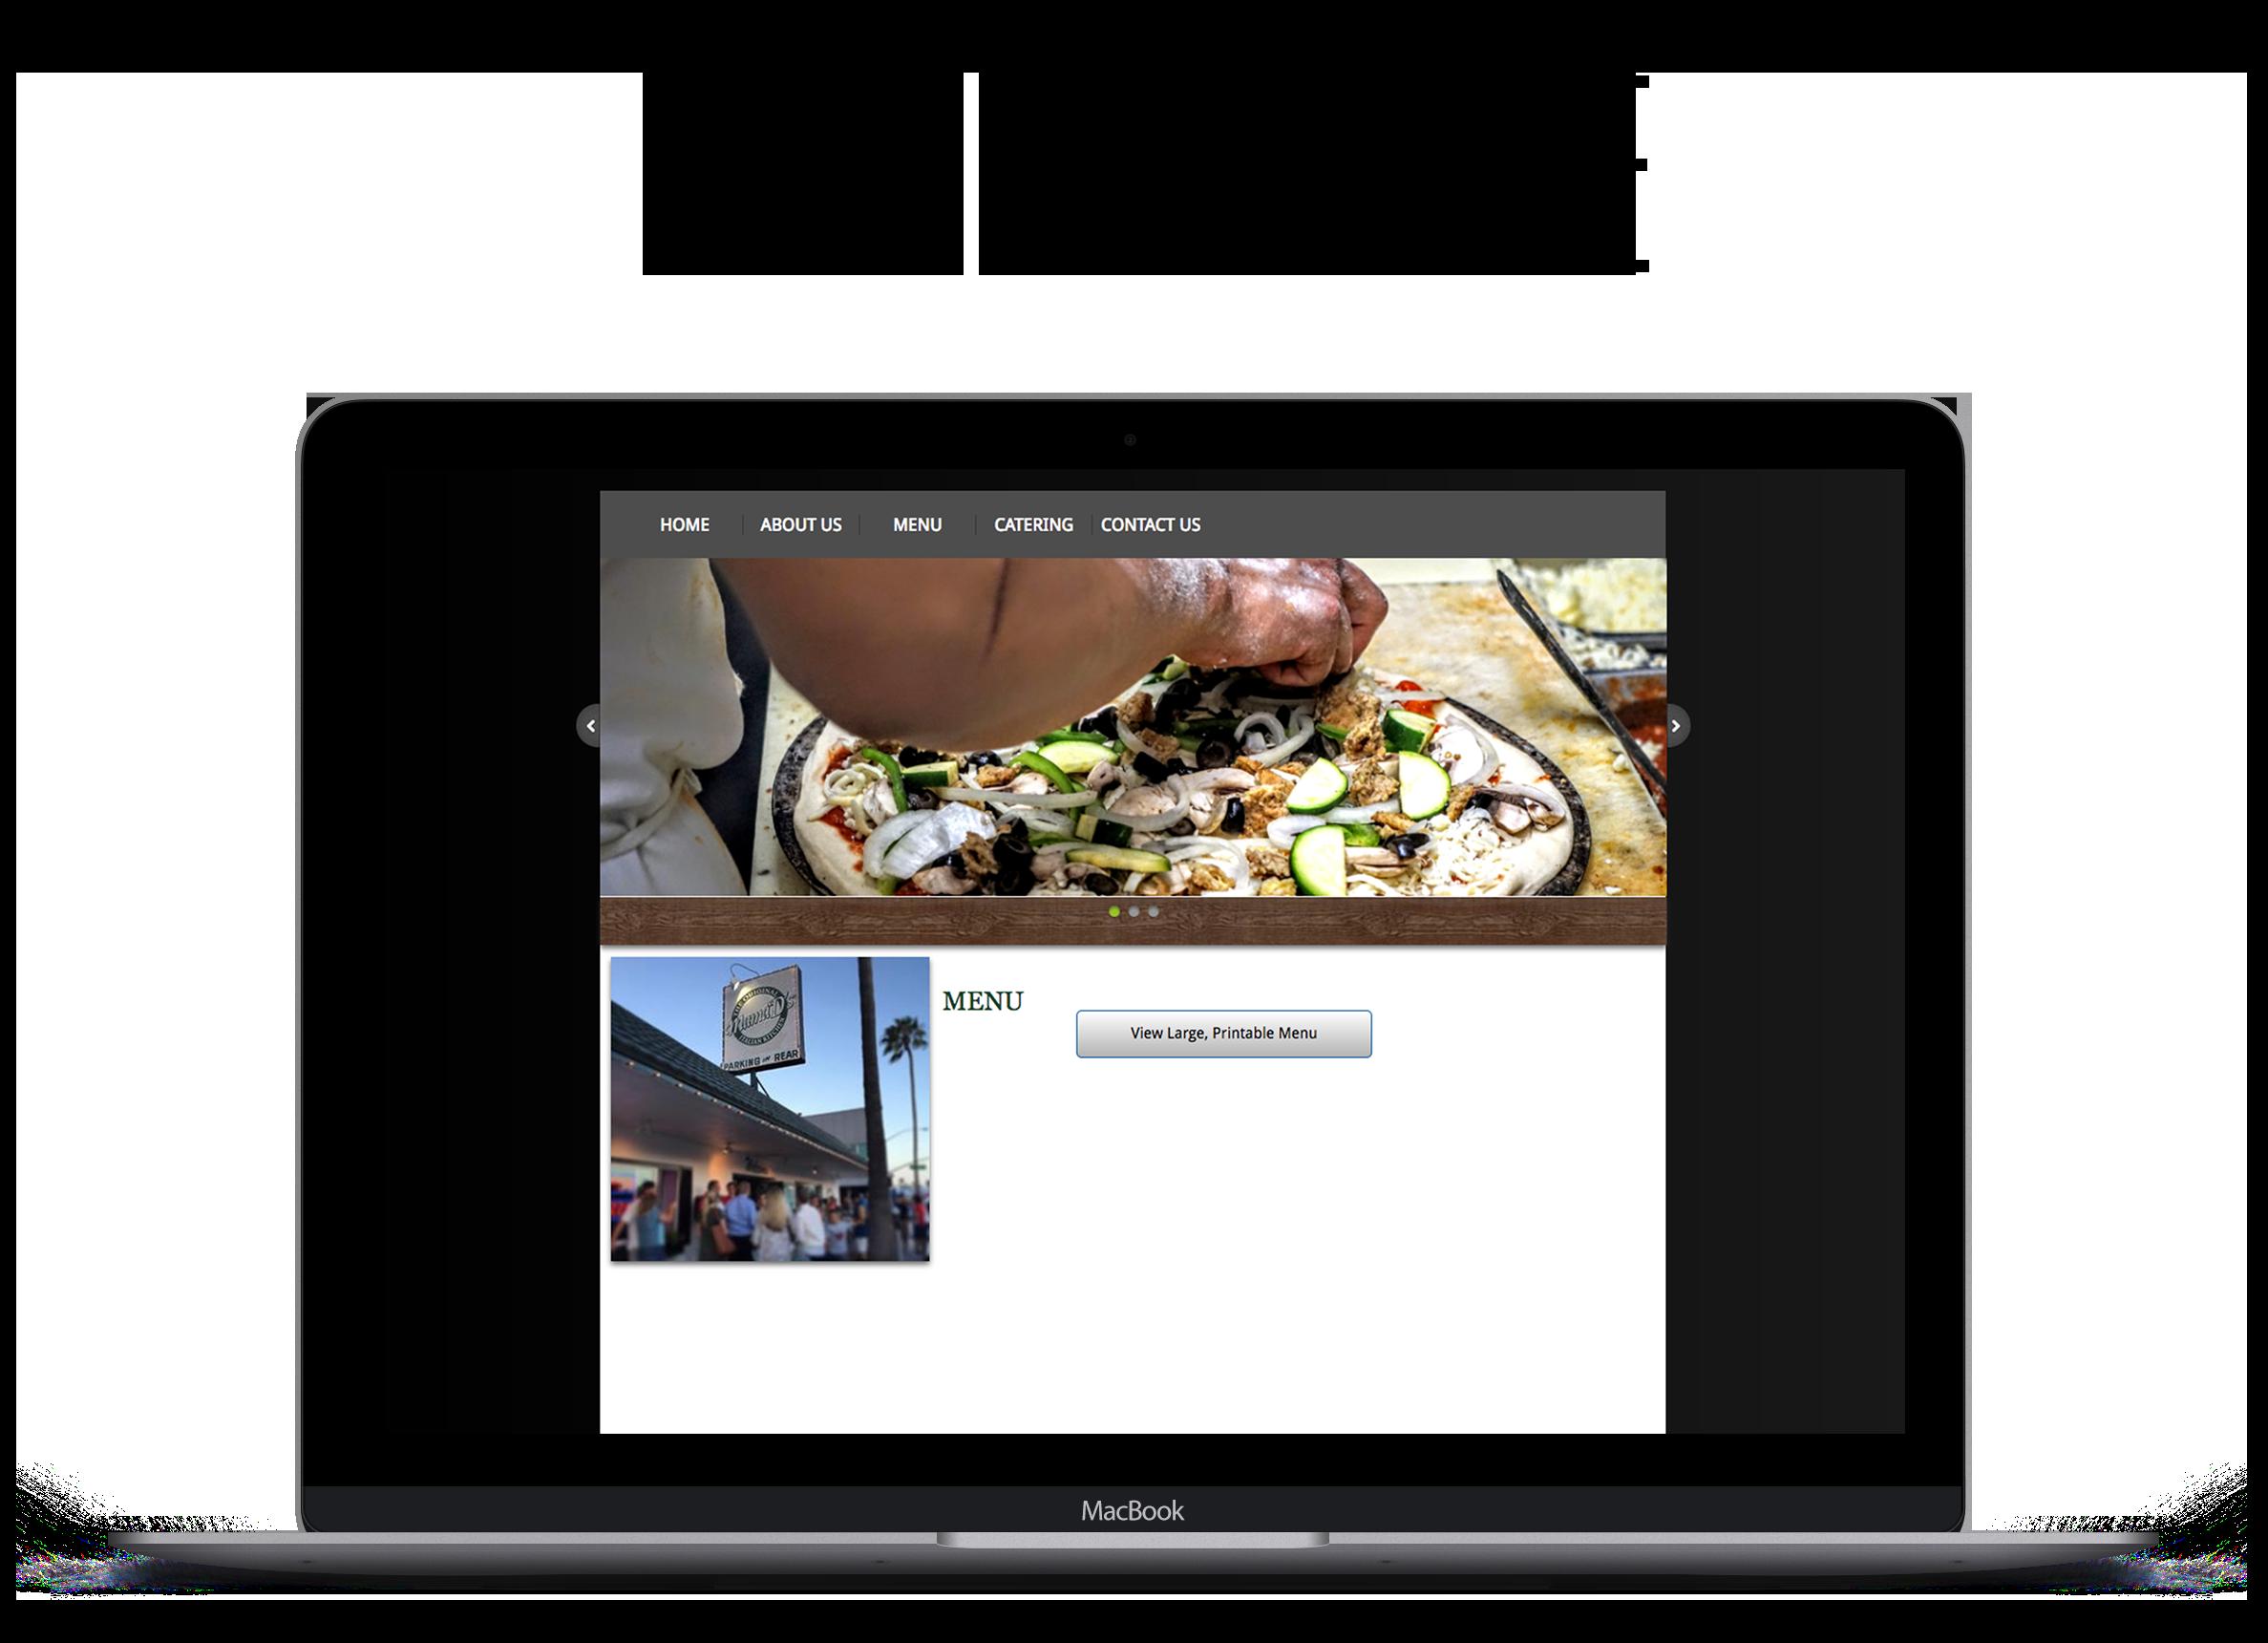 mamads-menu-BEFORE- macbook-mock-dribbble-Recovered.png